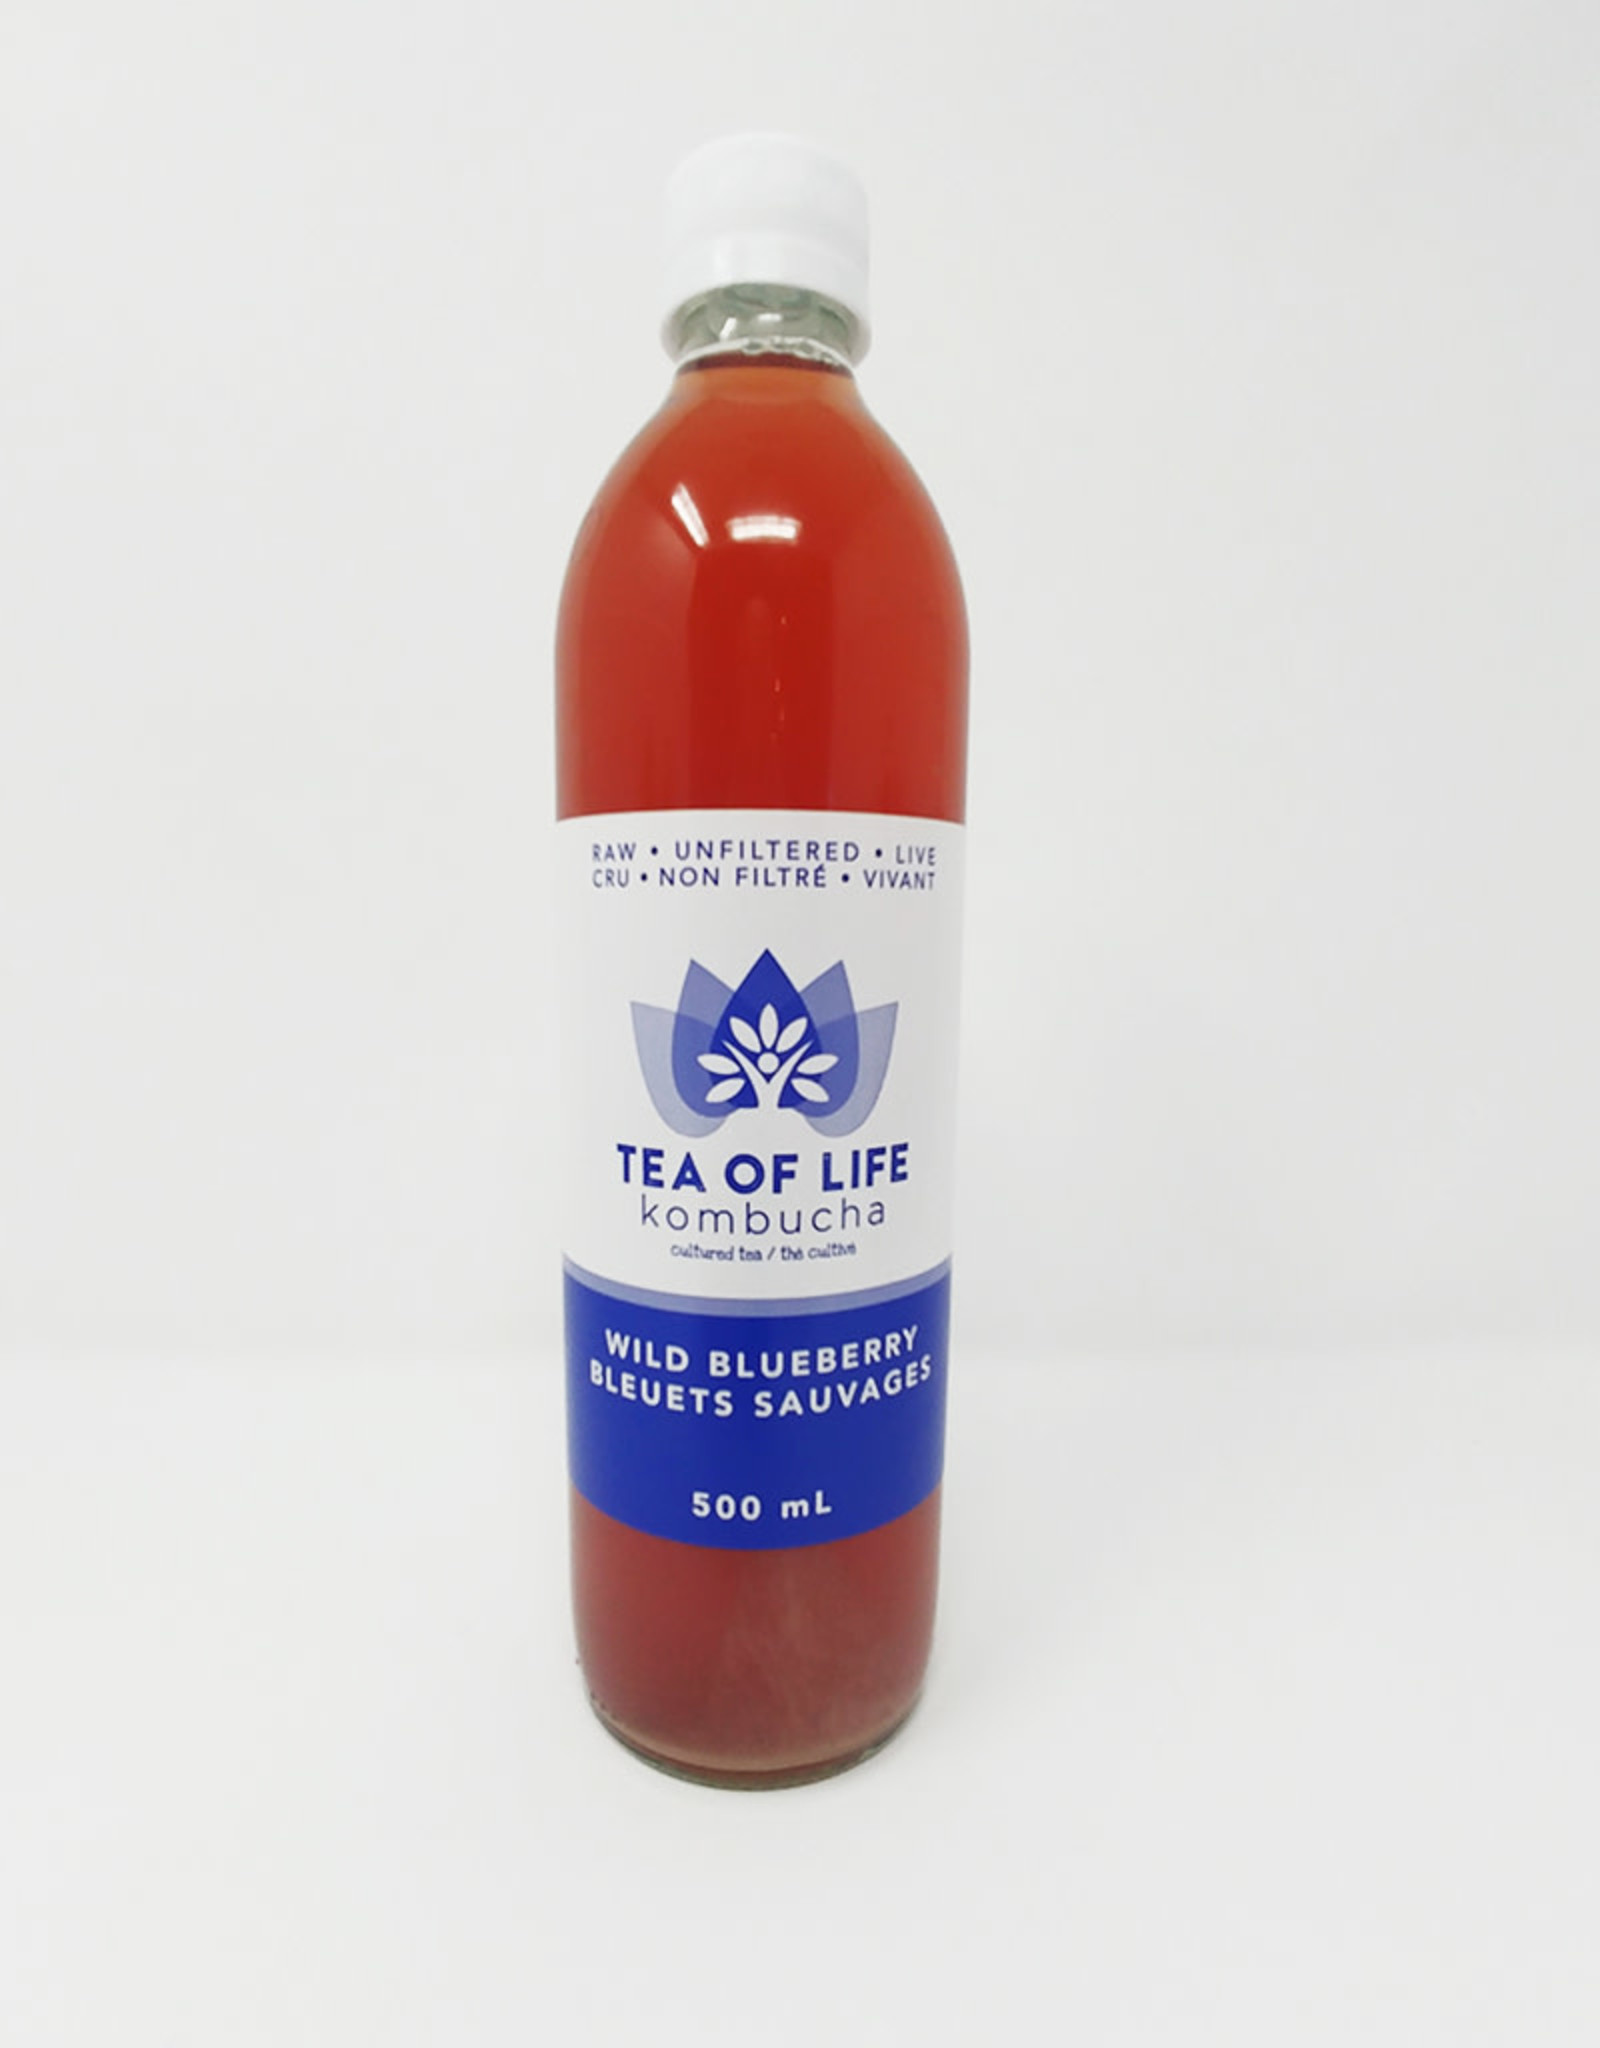 Tea of Life Tea of Life - Kombucha, Blueberry